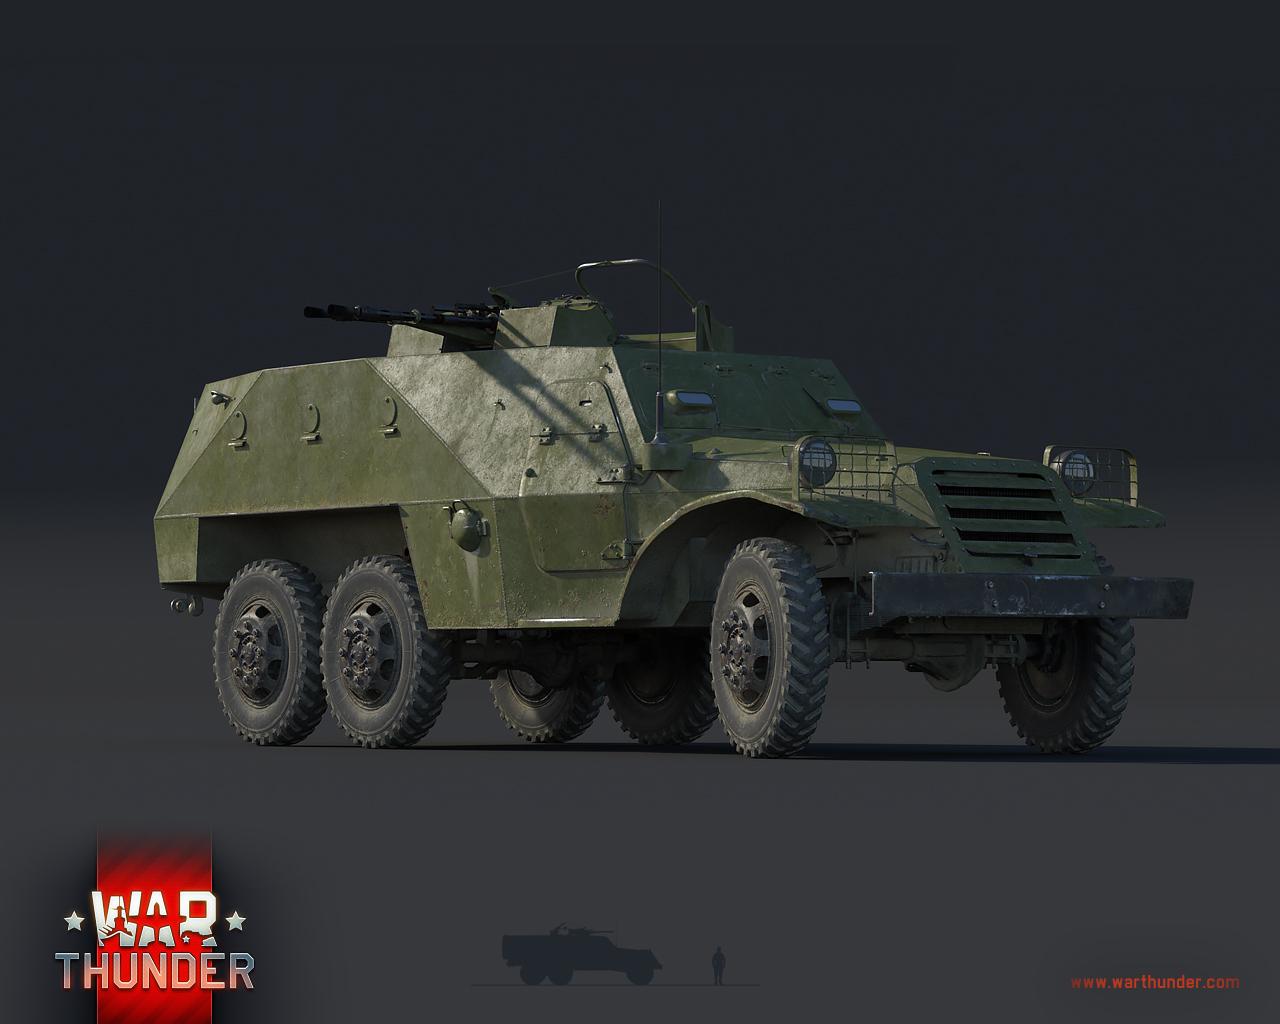 War Thunder Btr 152 Zpu The Armored Patrol